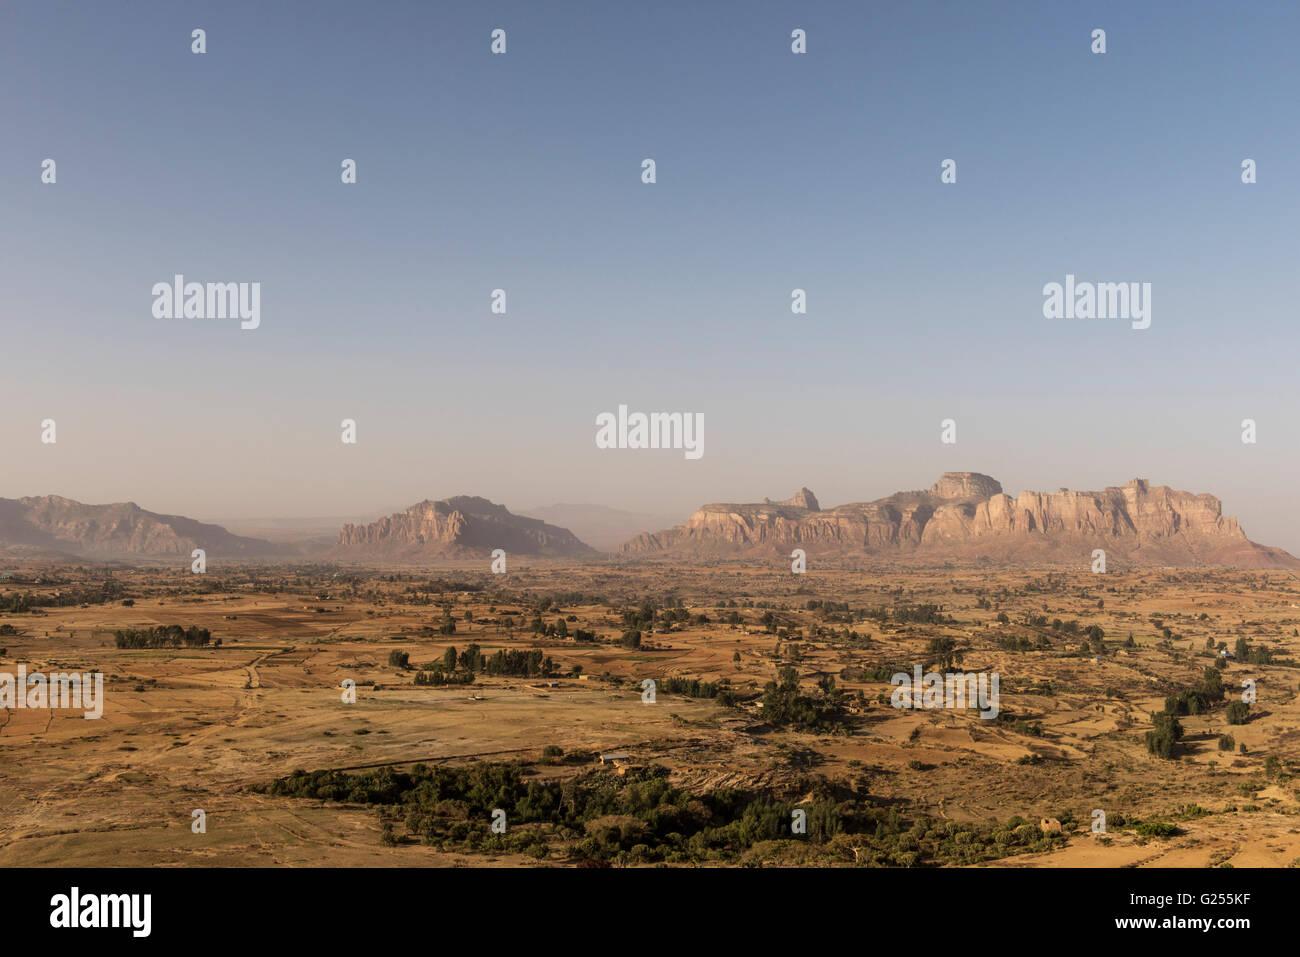 View of Gheralta, Ethiopia - Stock Image